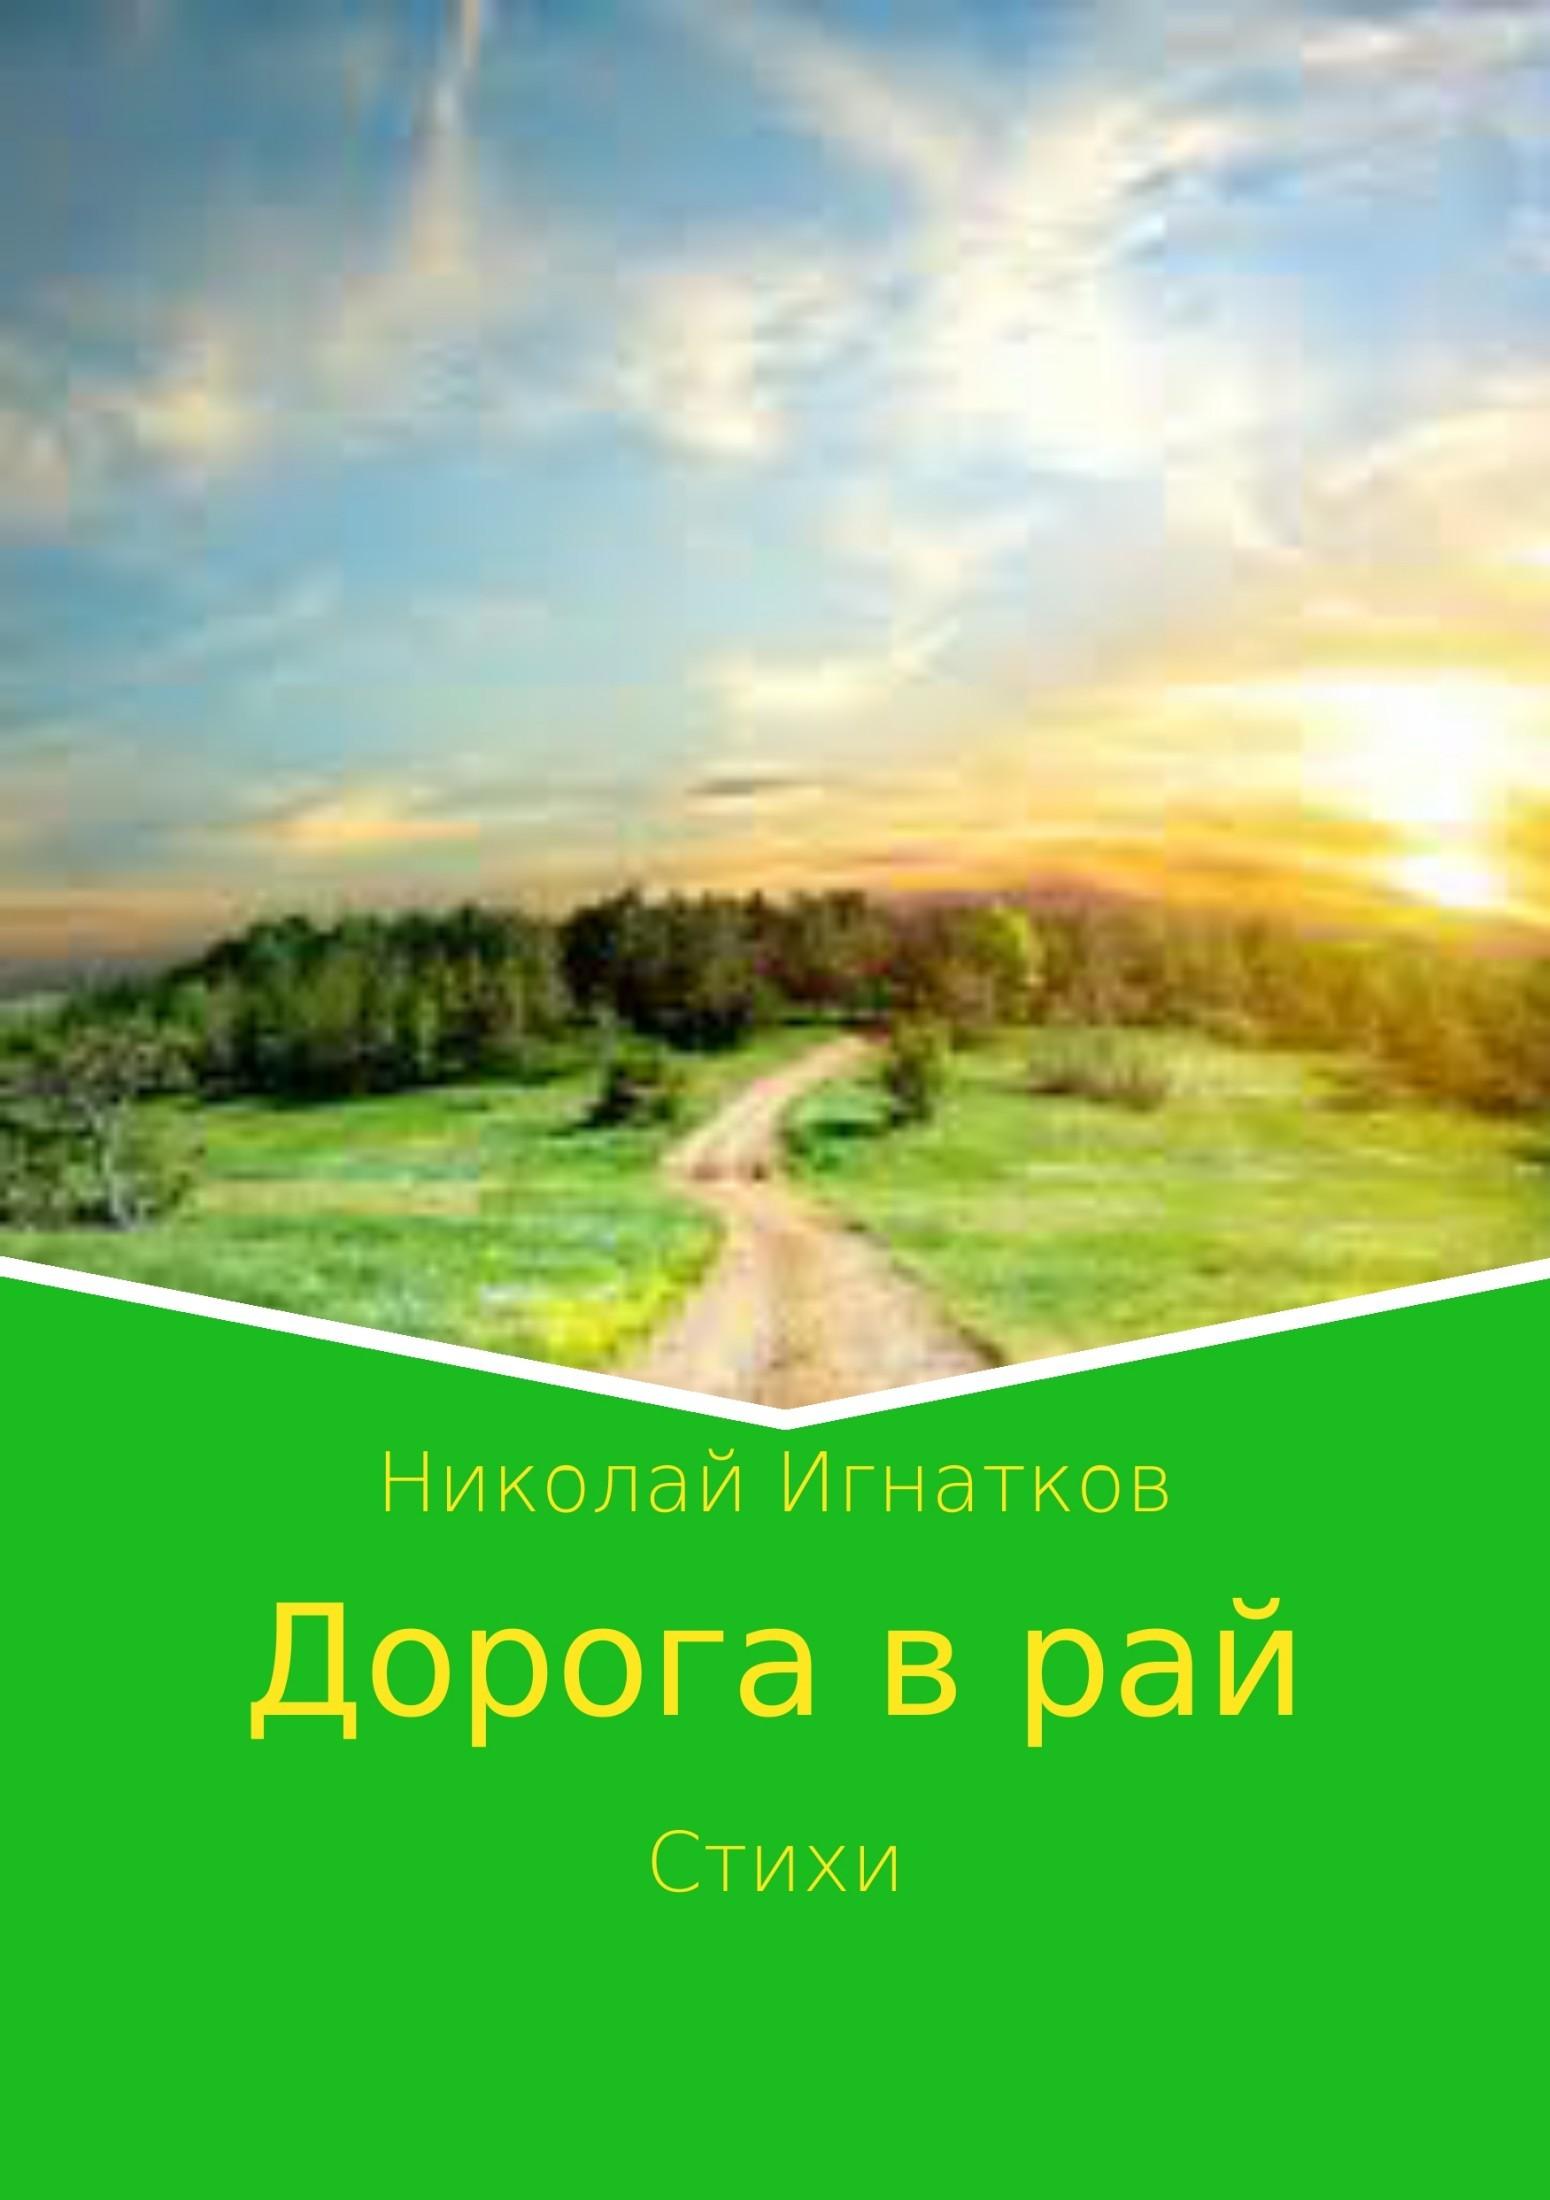 Николай Викторович Игнатков Дорога в рай последний рай на земле